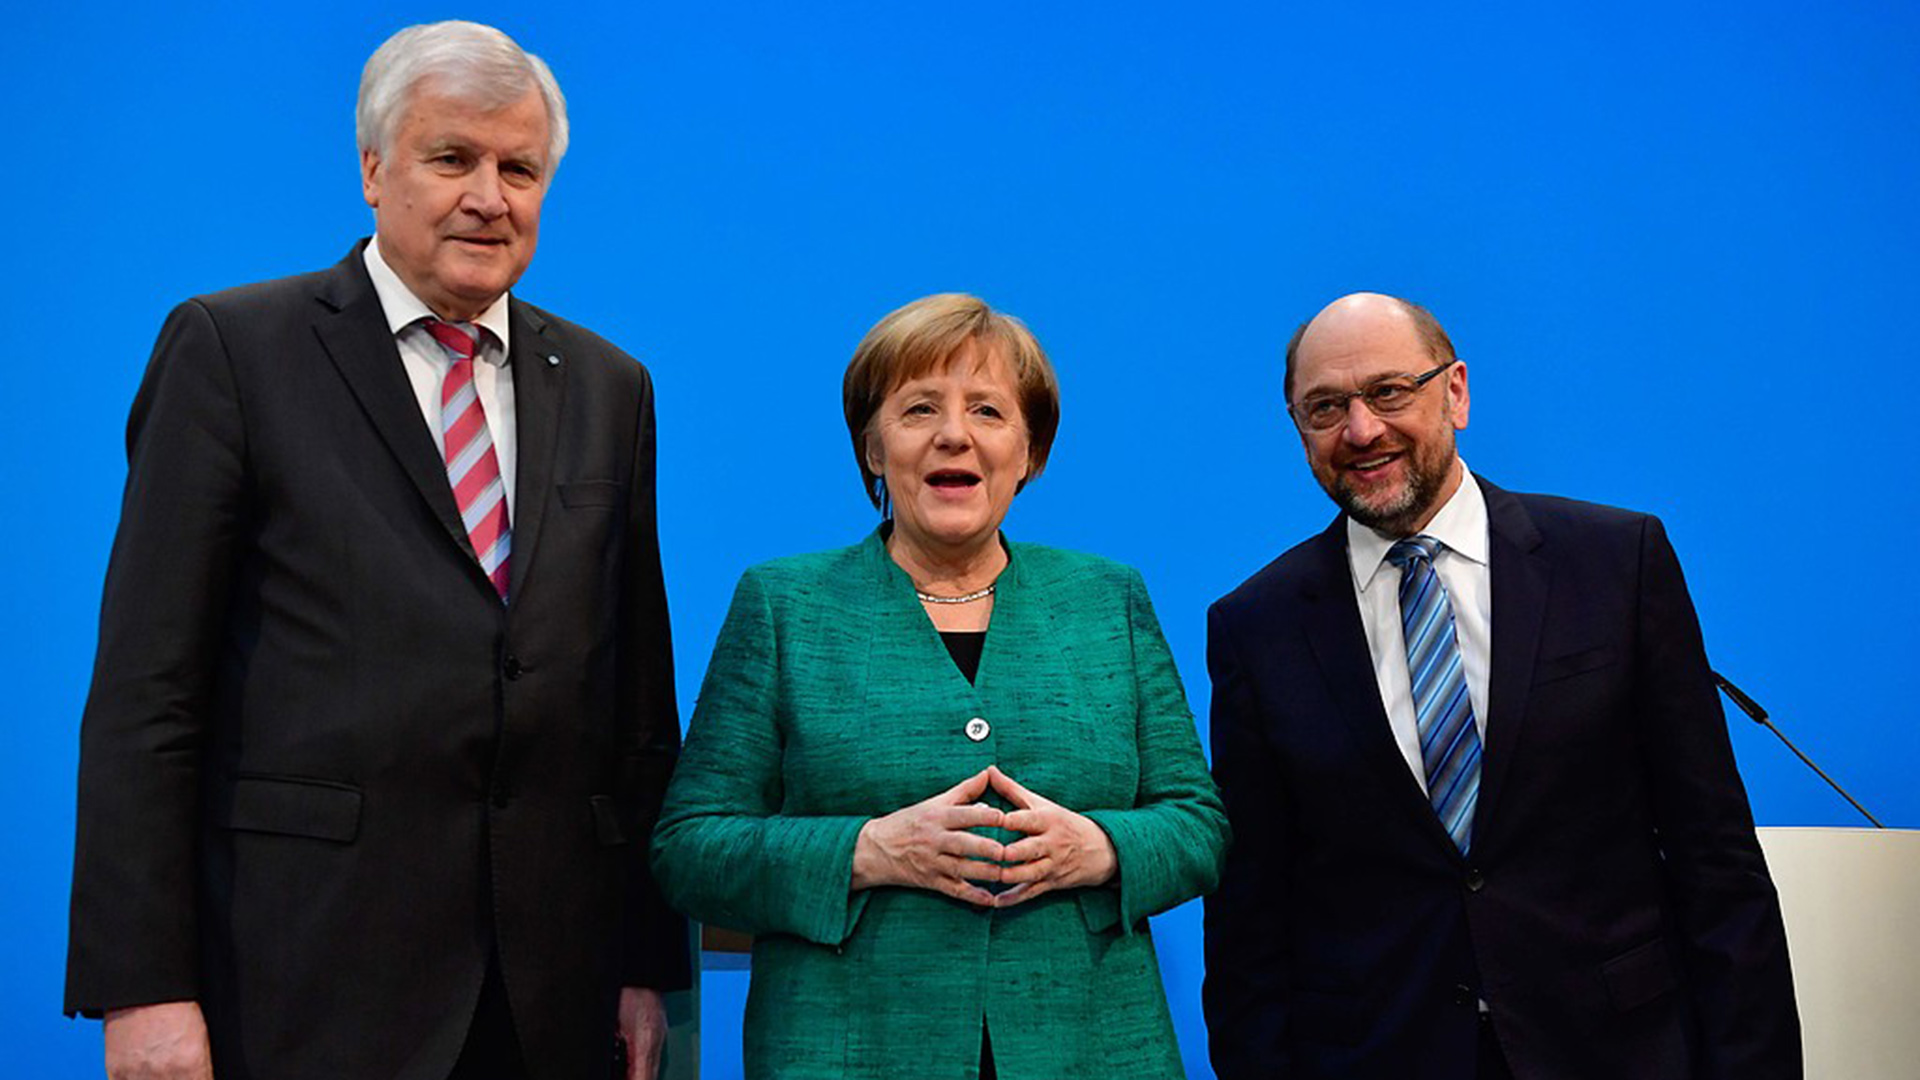 Tyska spds partiledare kollapsade